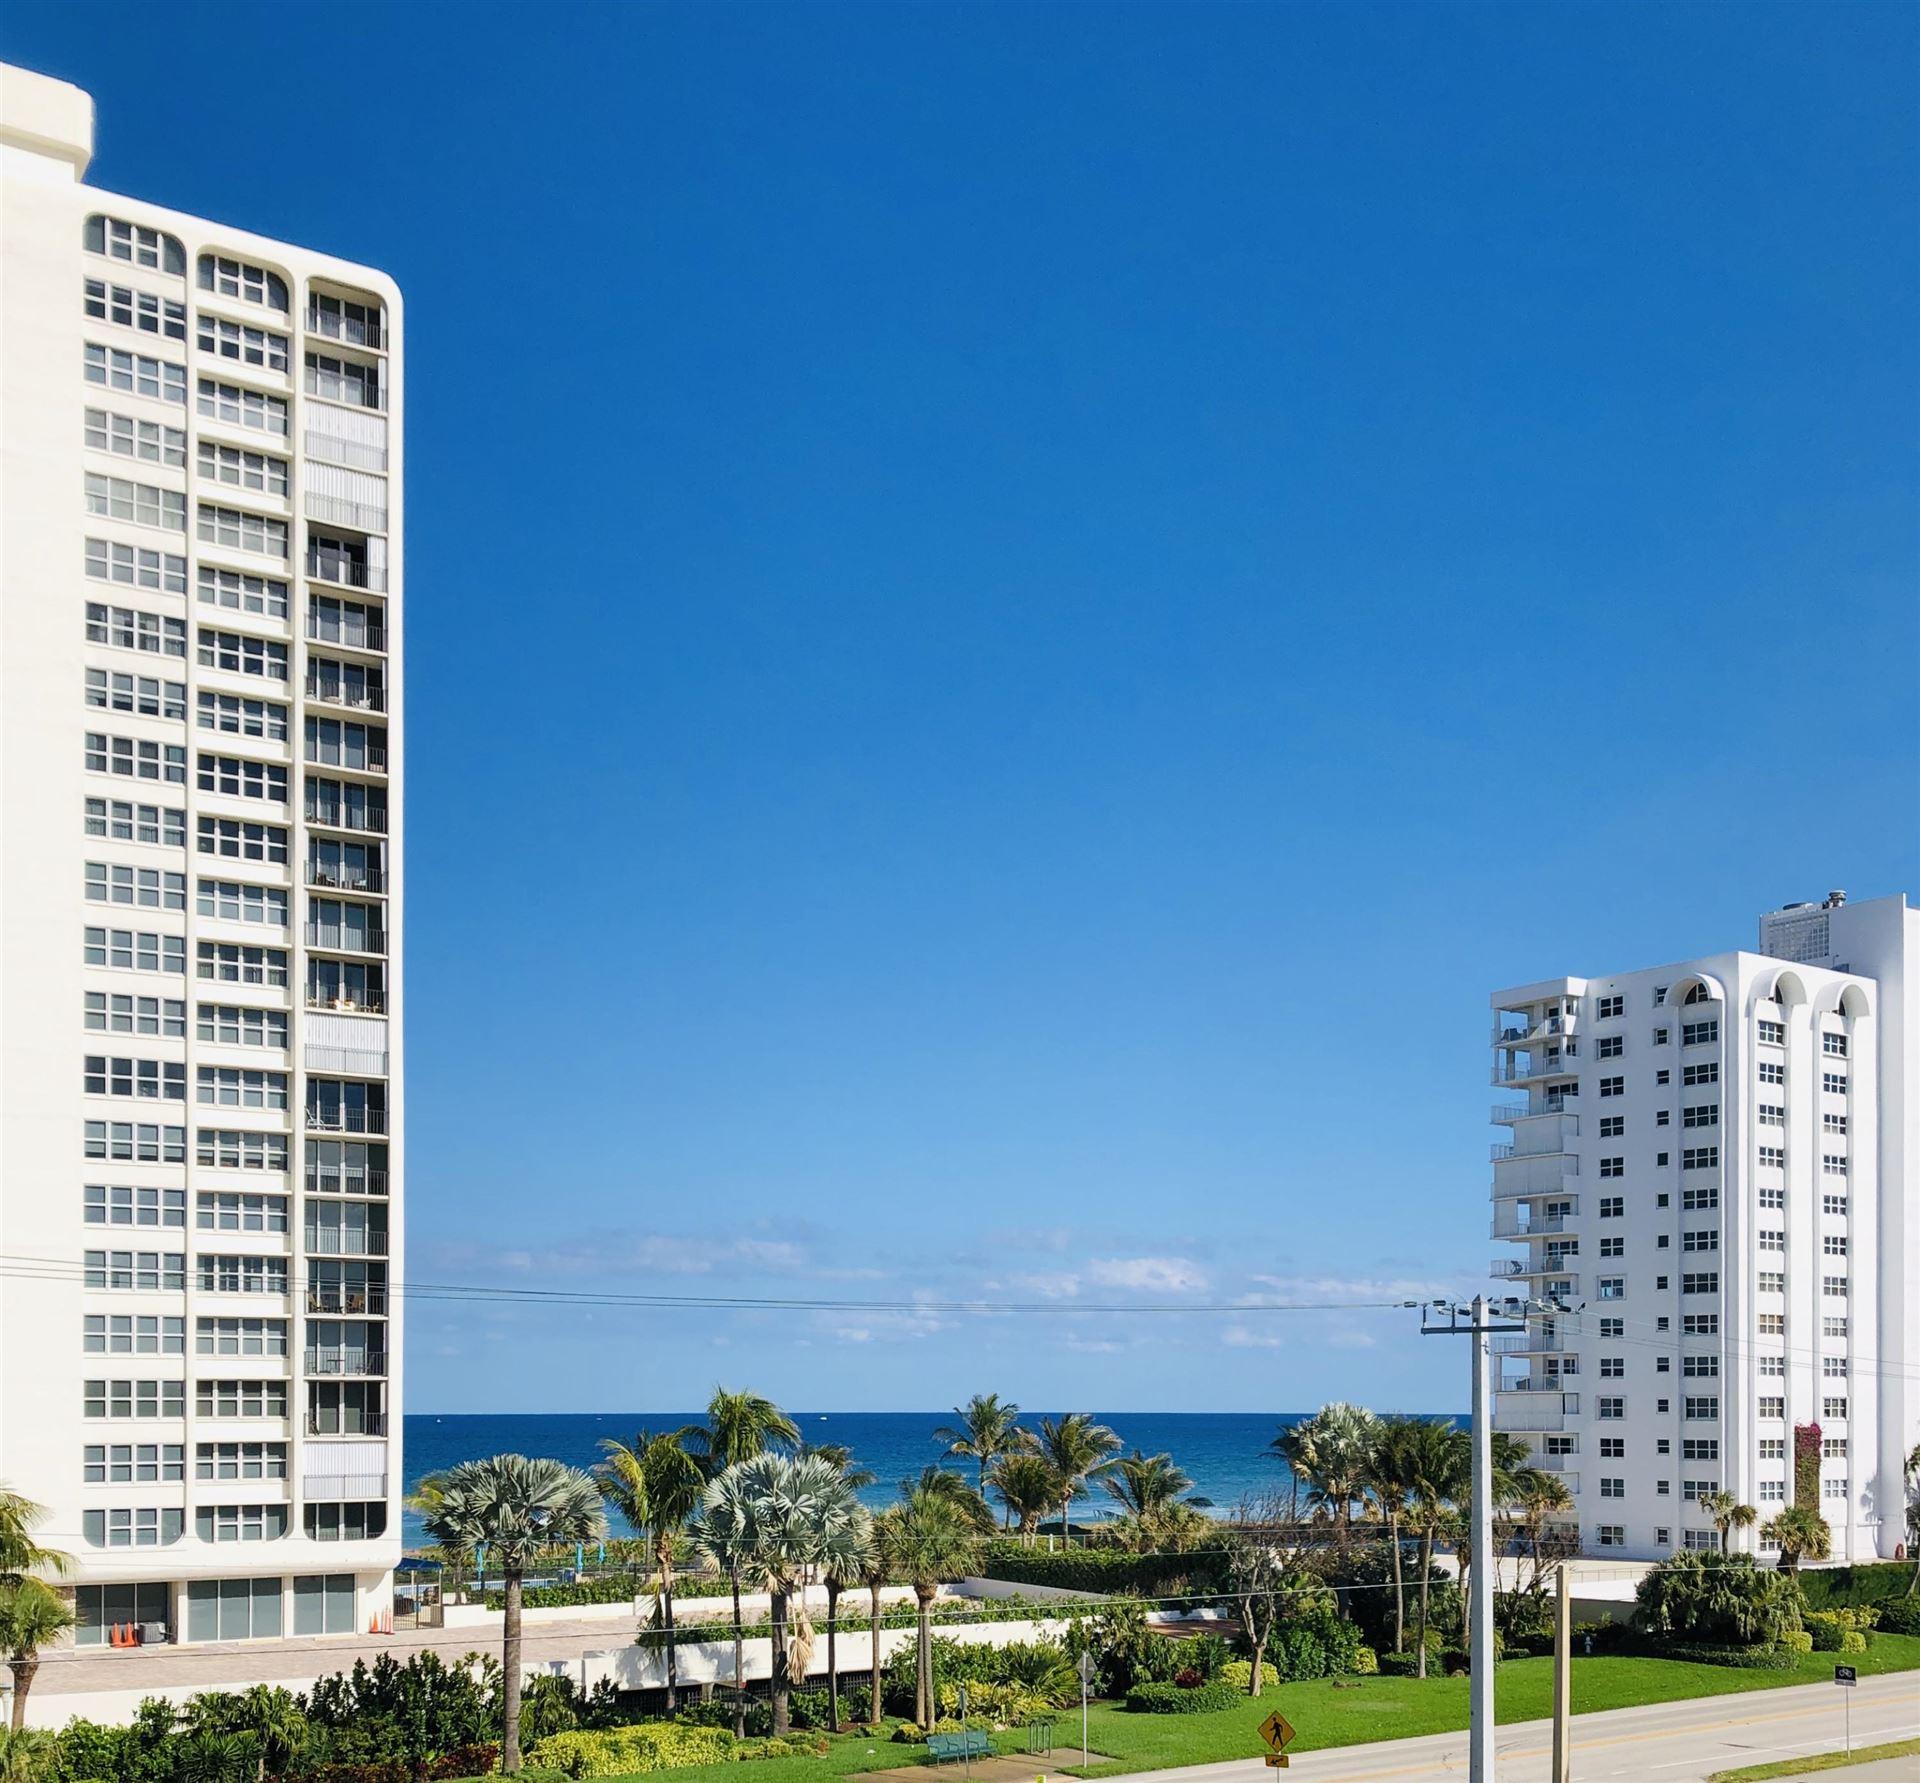 2851 S Ocean Boulevard #4r, Boca Raton, FL 33432 - #: RX-10669239